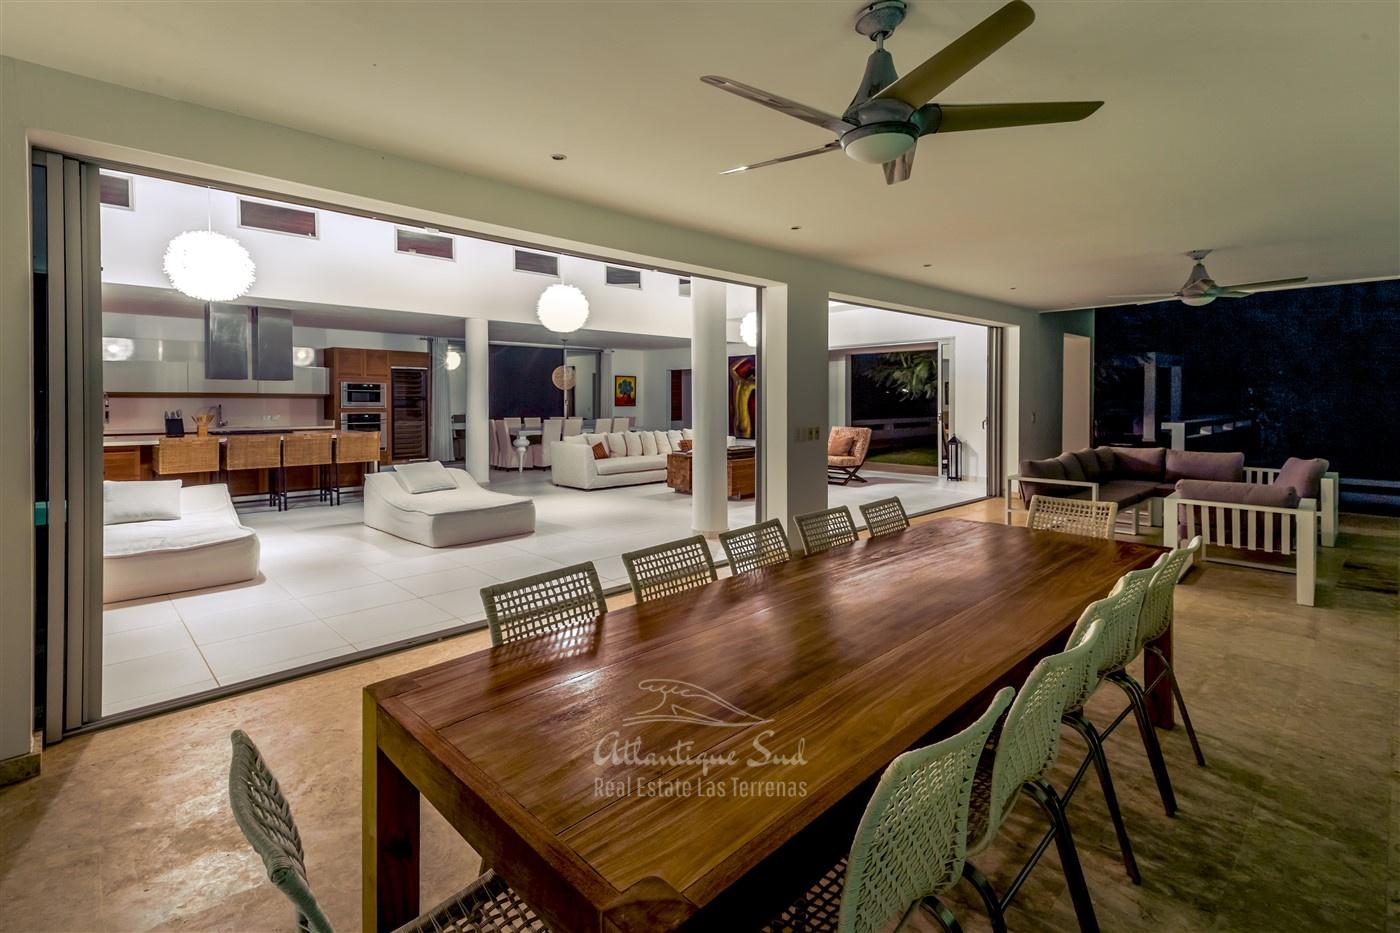 Modern Villa on a hill with ocean views Real Estate Las Terrenas Dominican Republic23.jpg